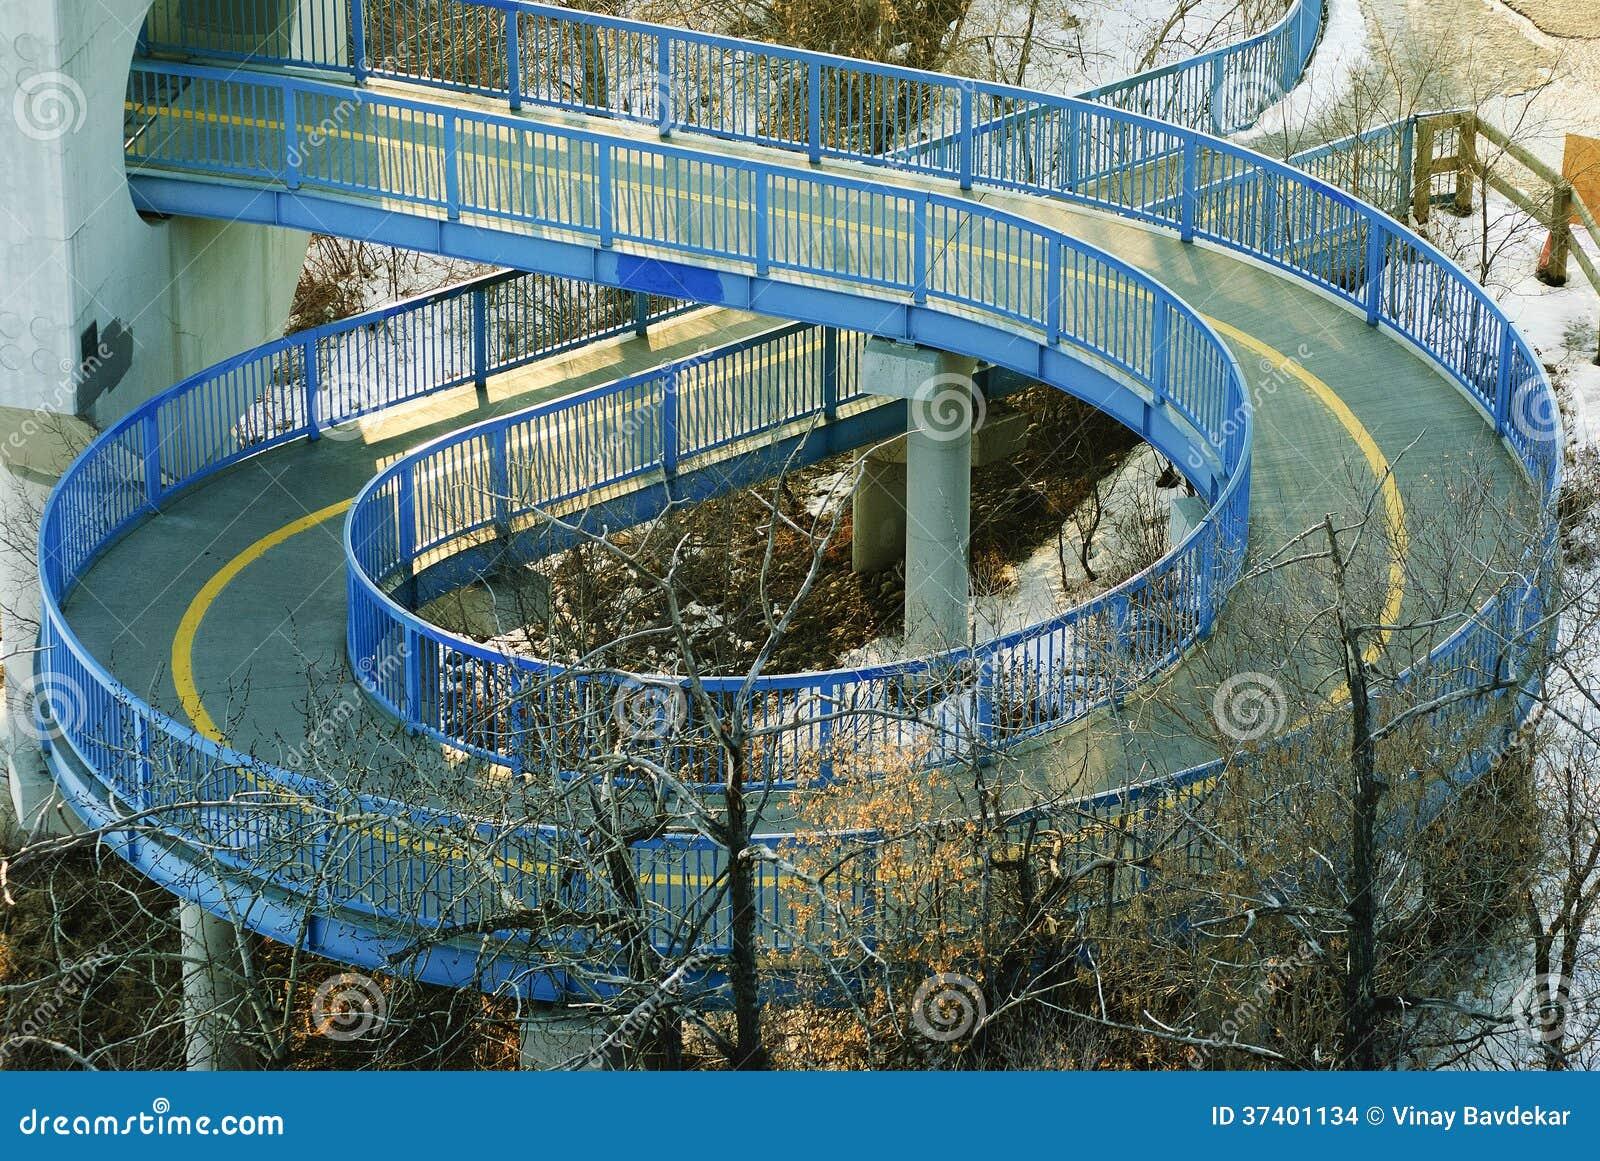 Spiral Walkway Below Lrt In Edmonton Stock Photo Image Of